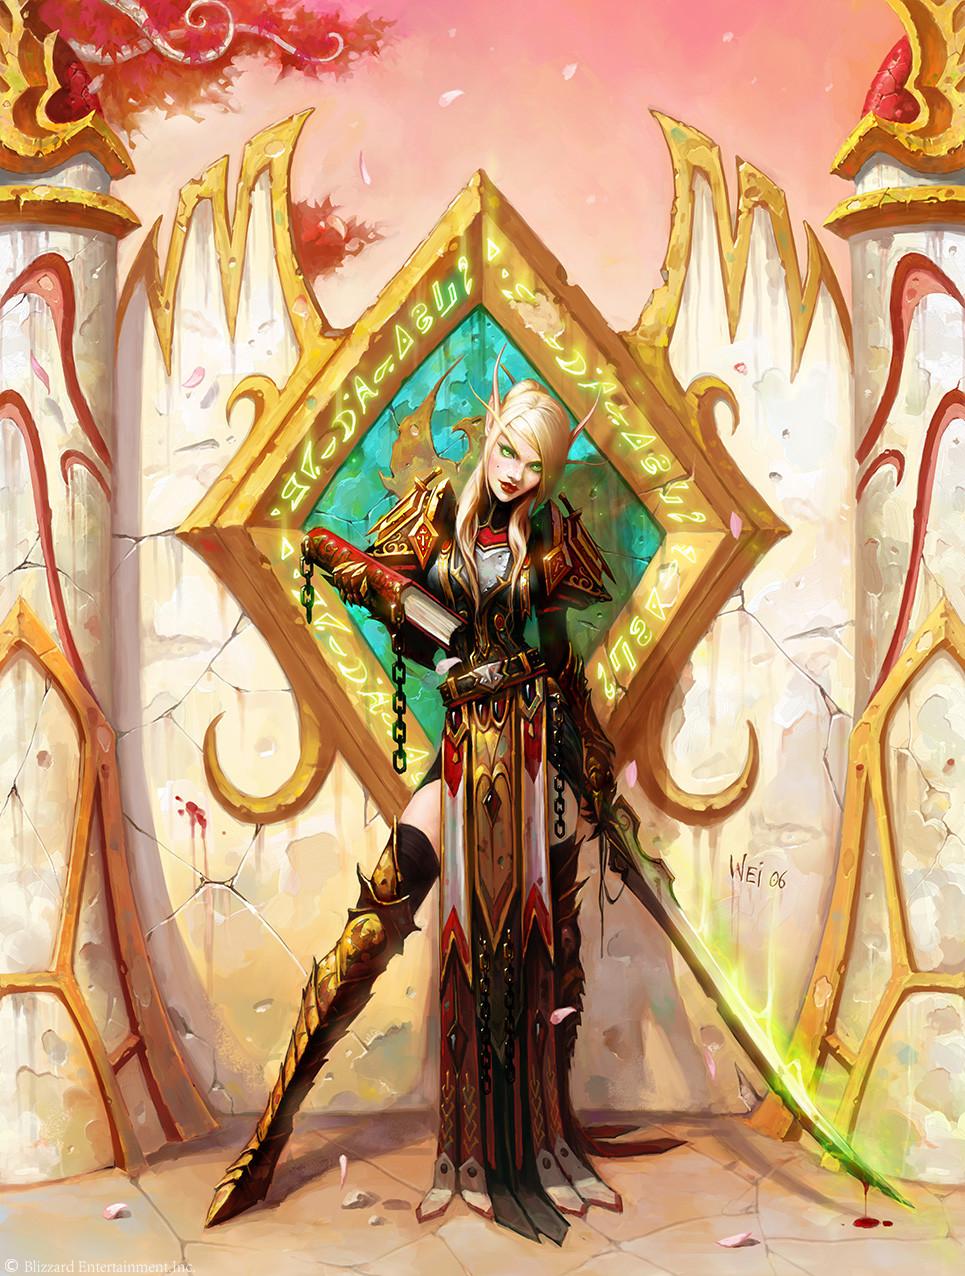 ArtStation - The Art of Warcraft, Wei Wang